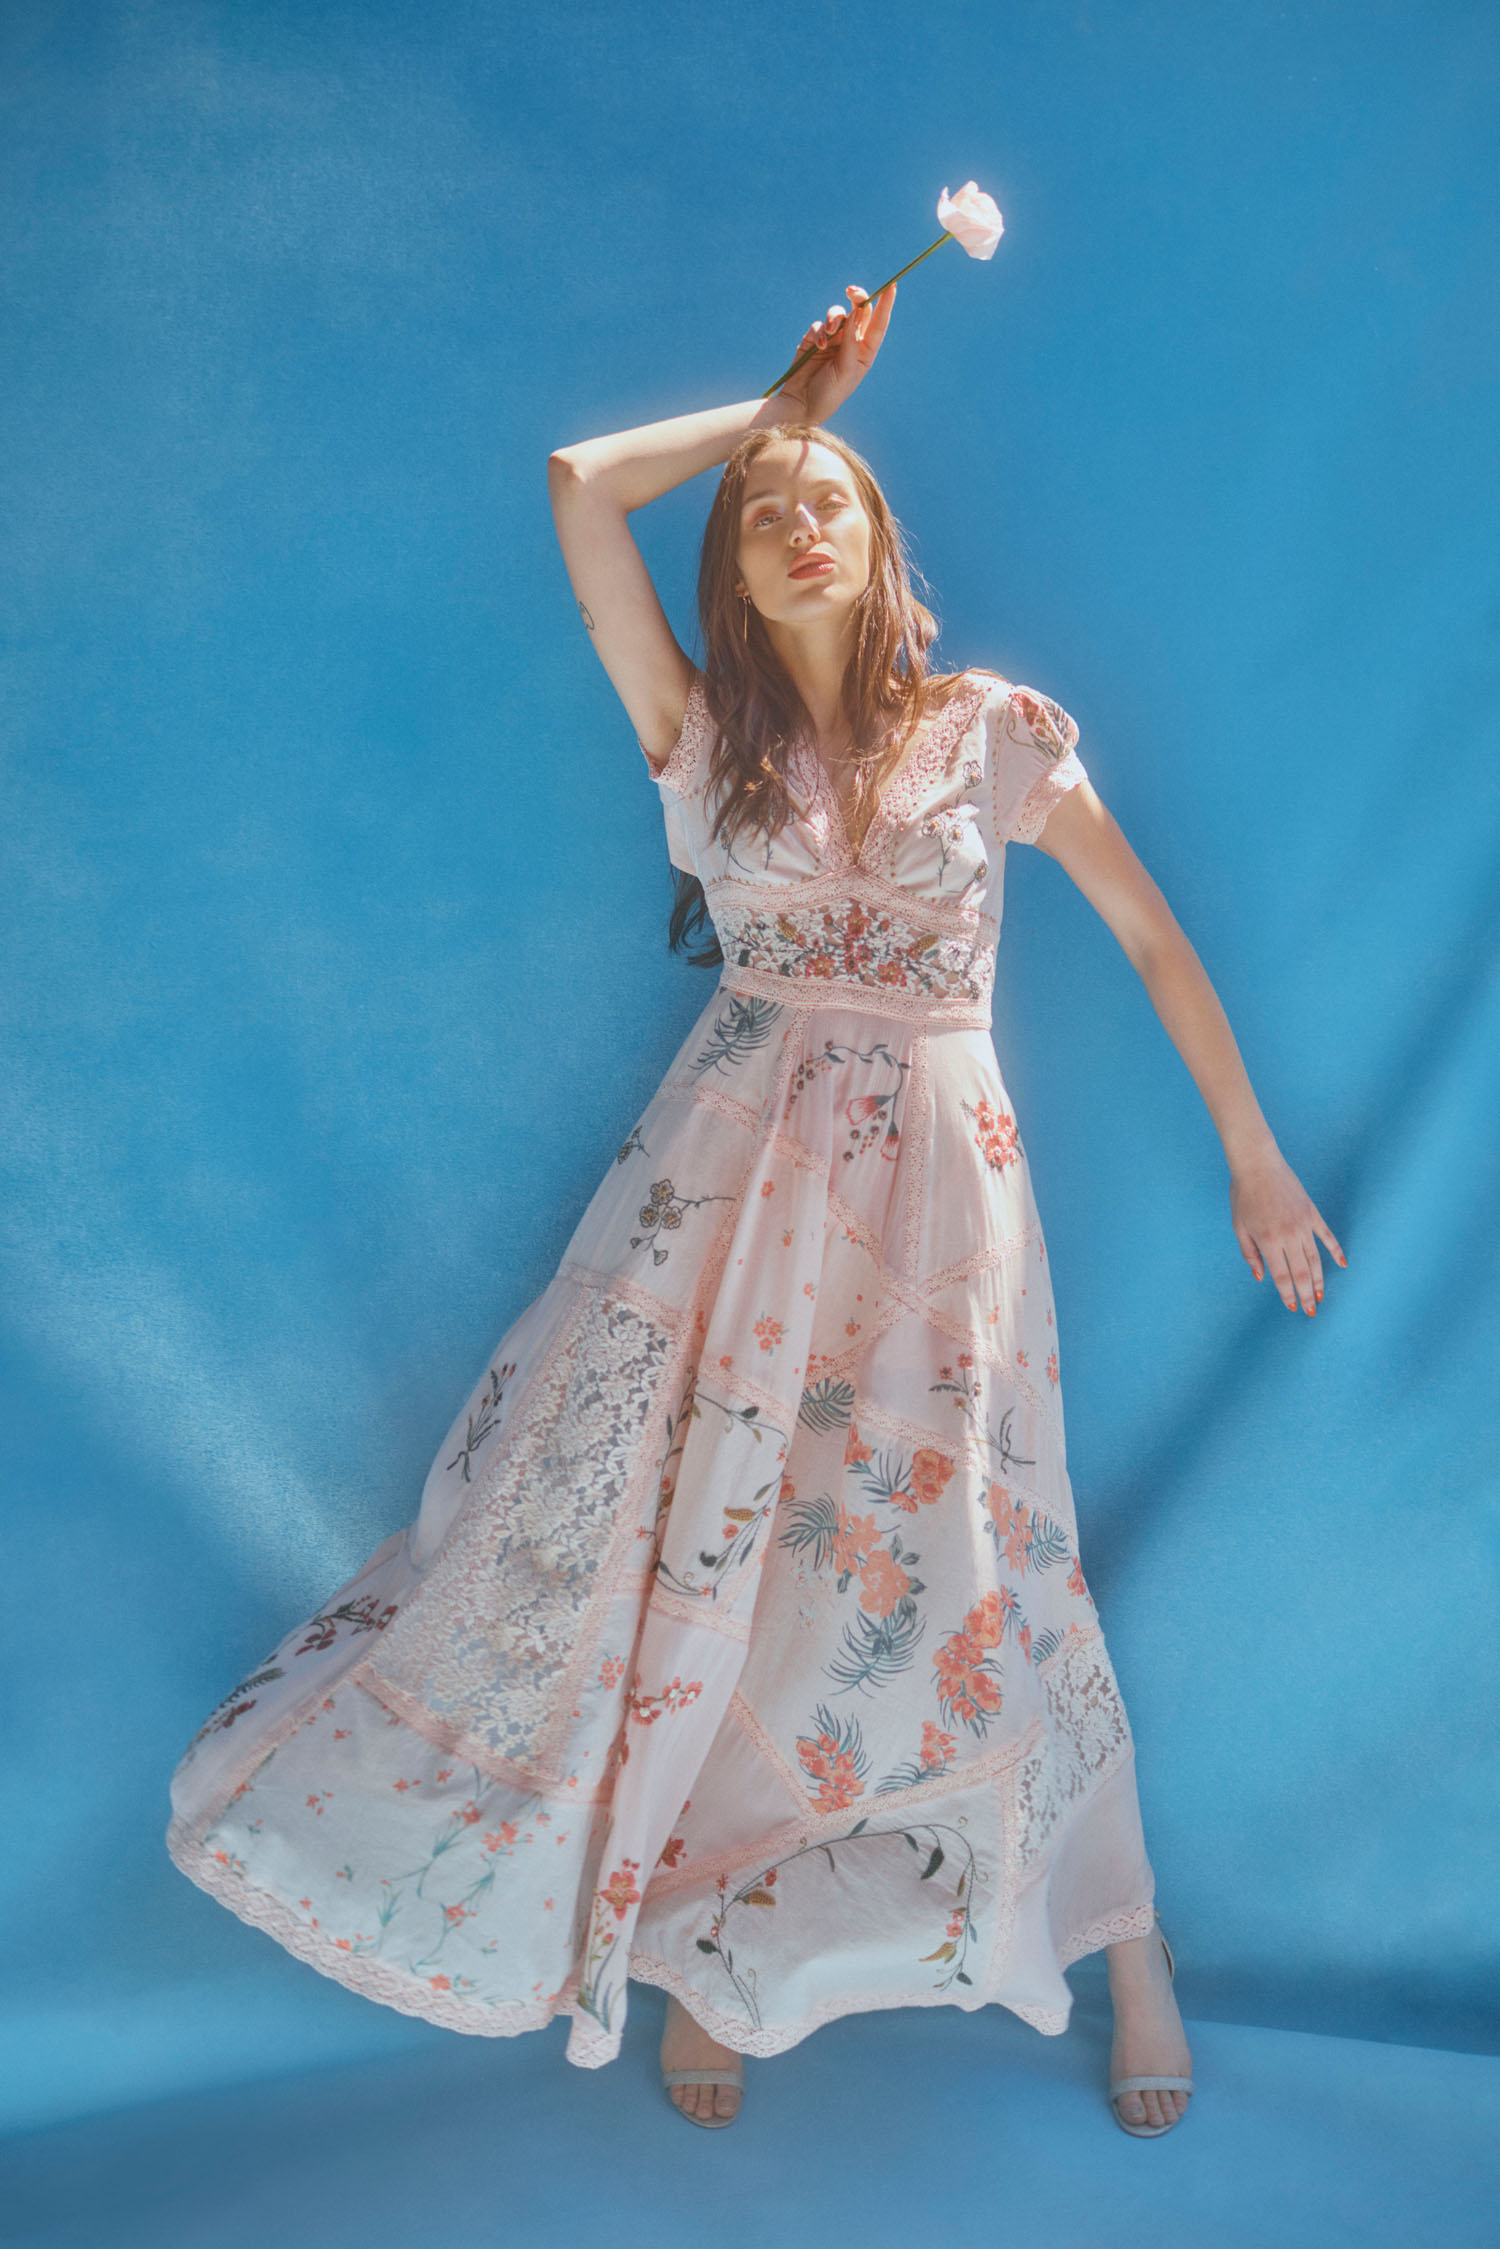 BHLDN x Free People pink floral bridesmaids dress